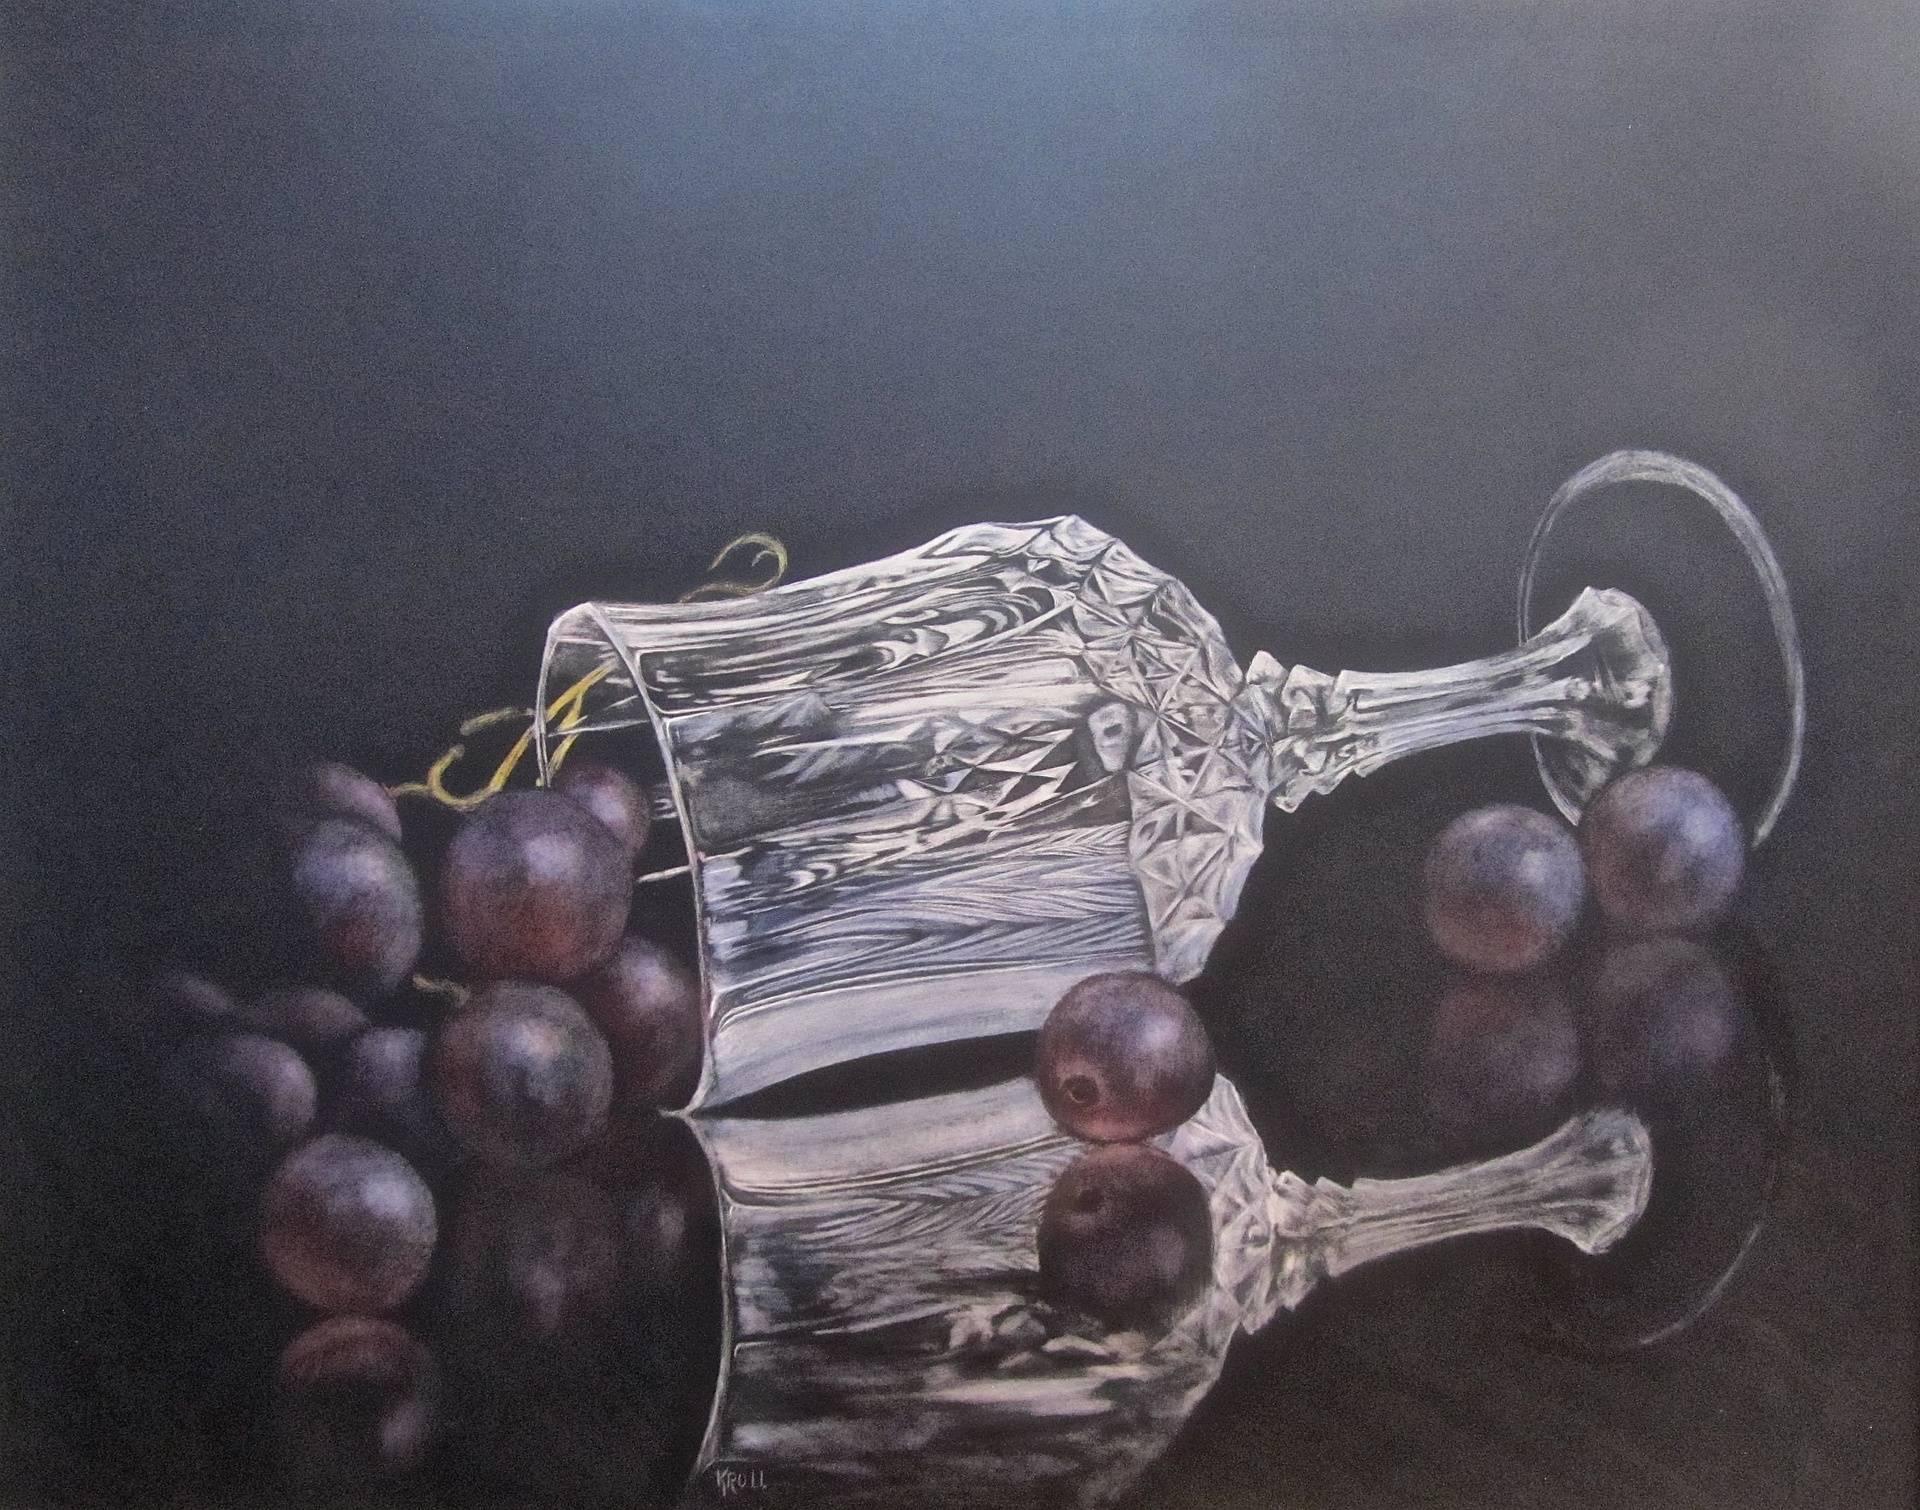 Spilled Grapes